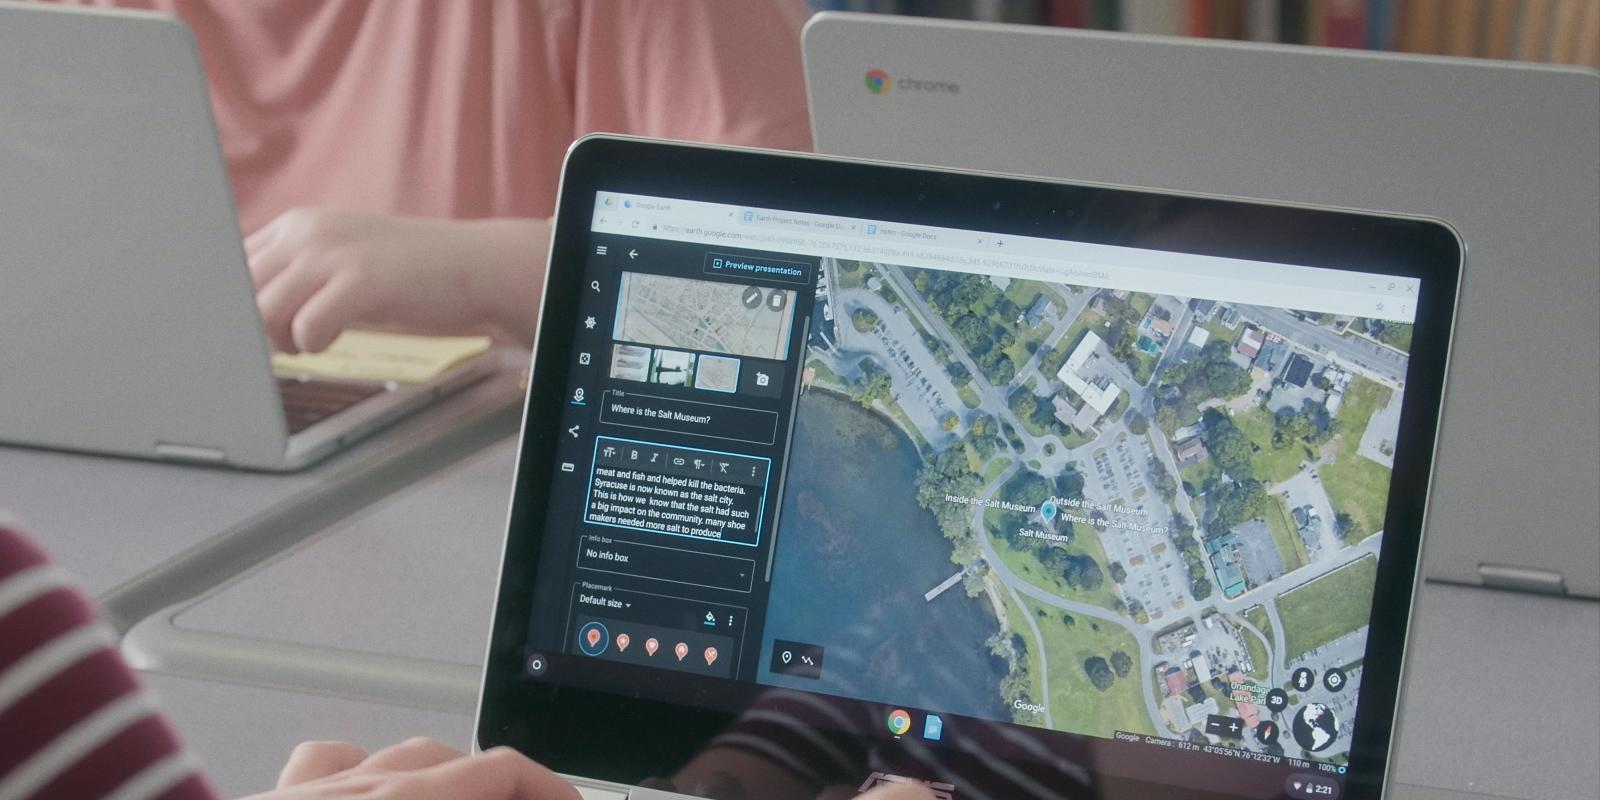 New markup creation tools make Google Earth a free storytelling platform